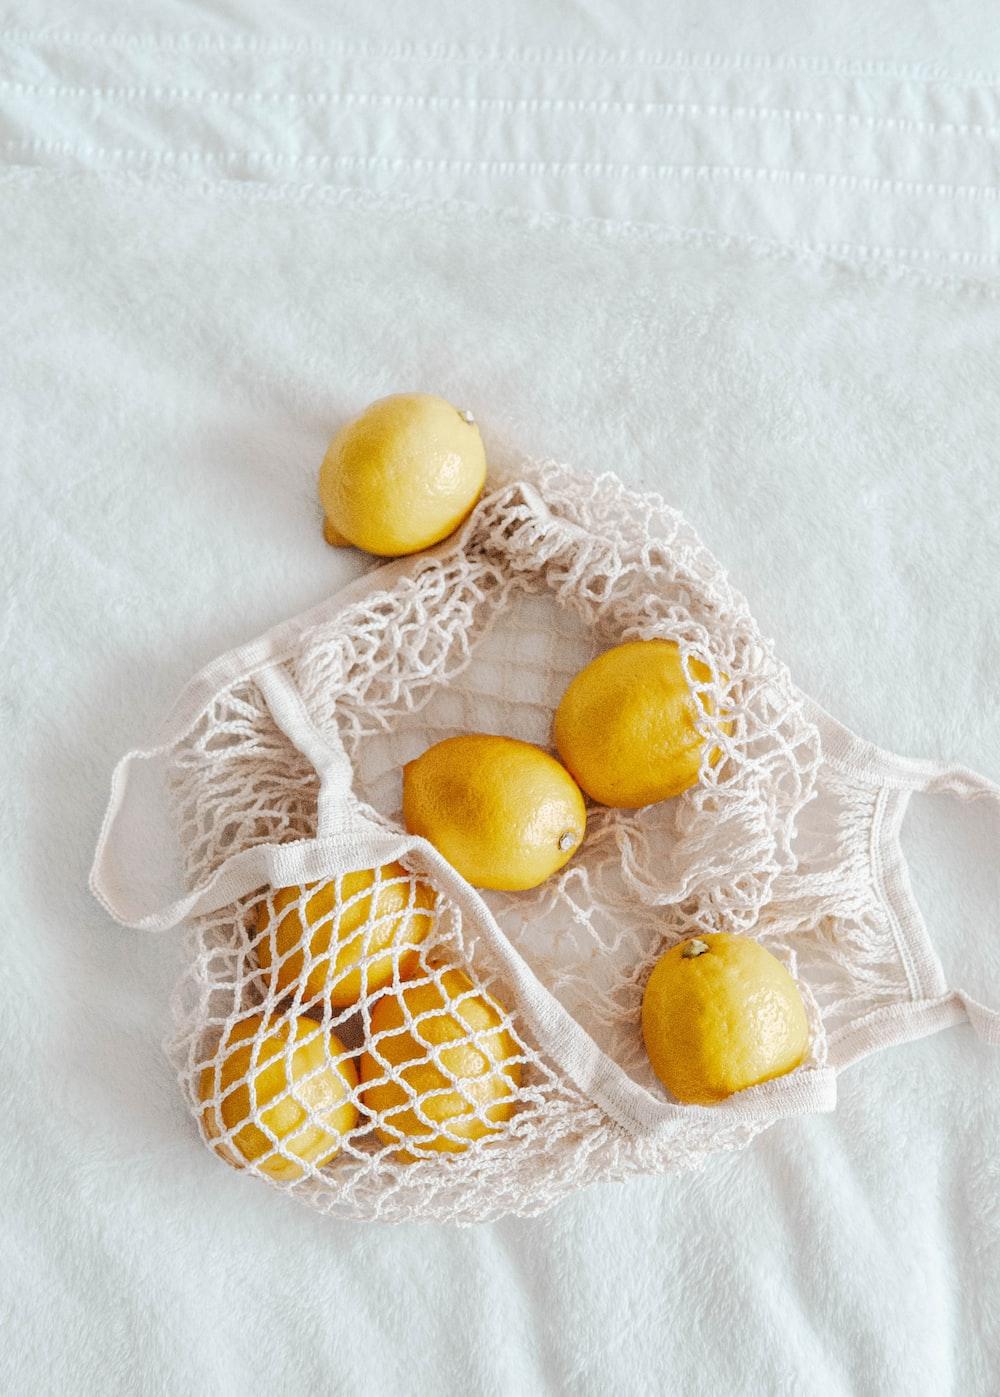 yellow citrus fruit on white lace textile